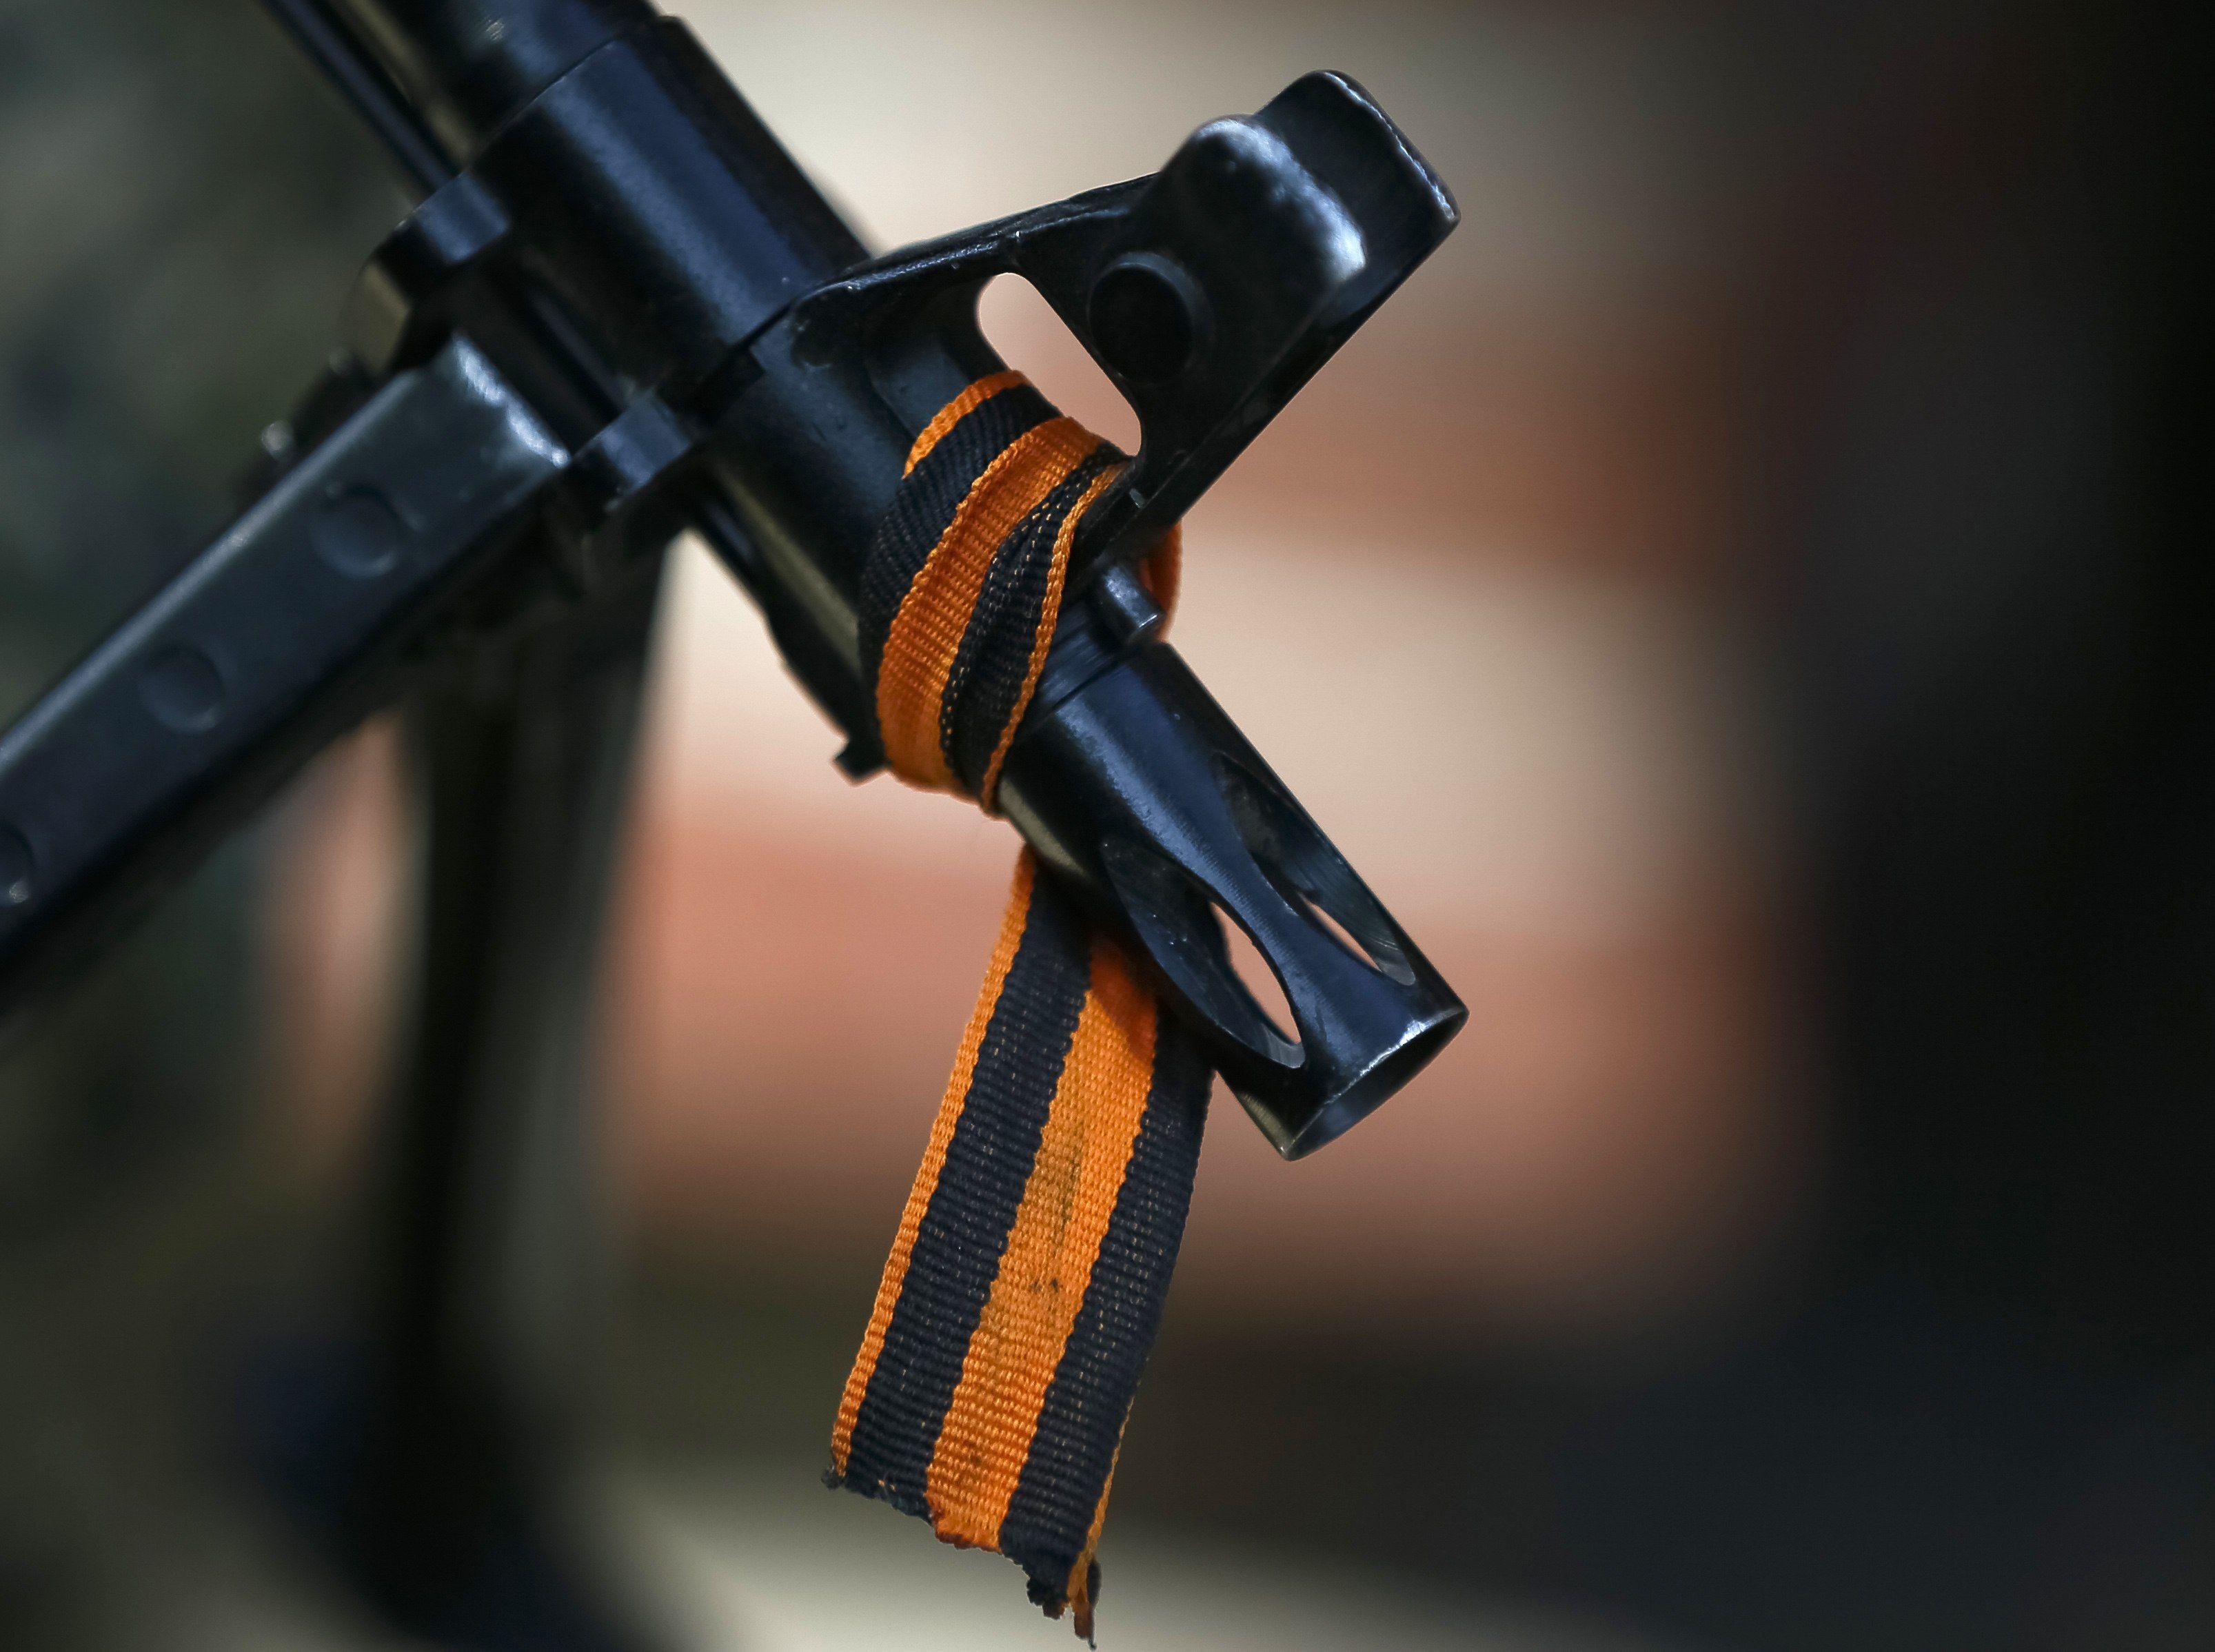 Боевики 17 раз обстреляли позиции силовиков на Донбассе